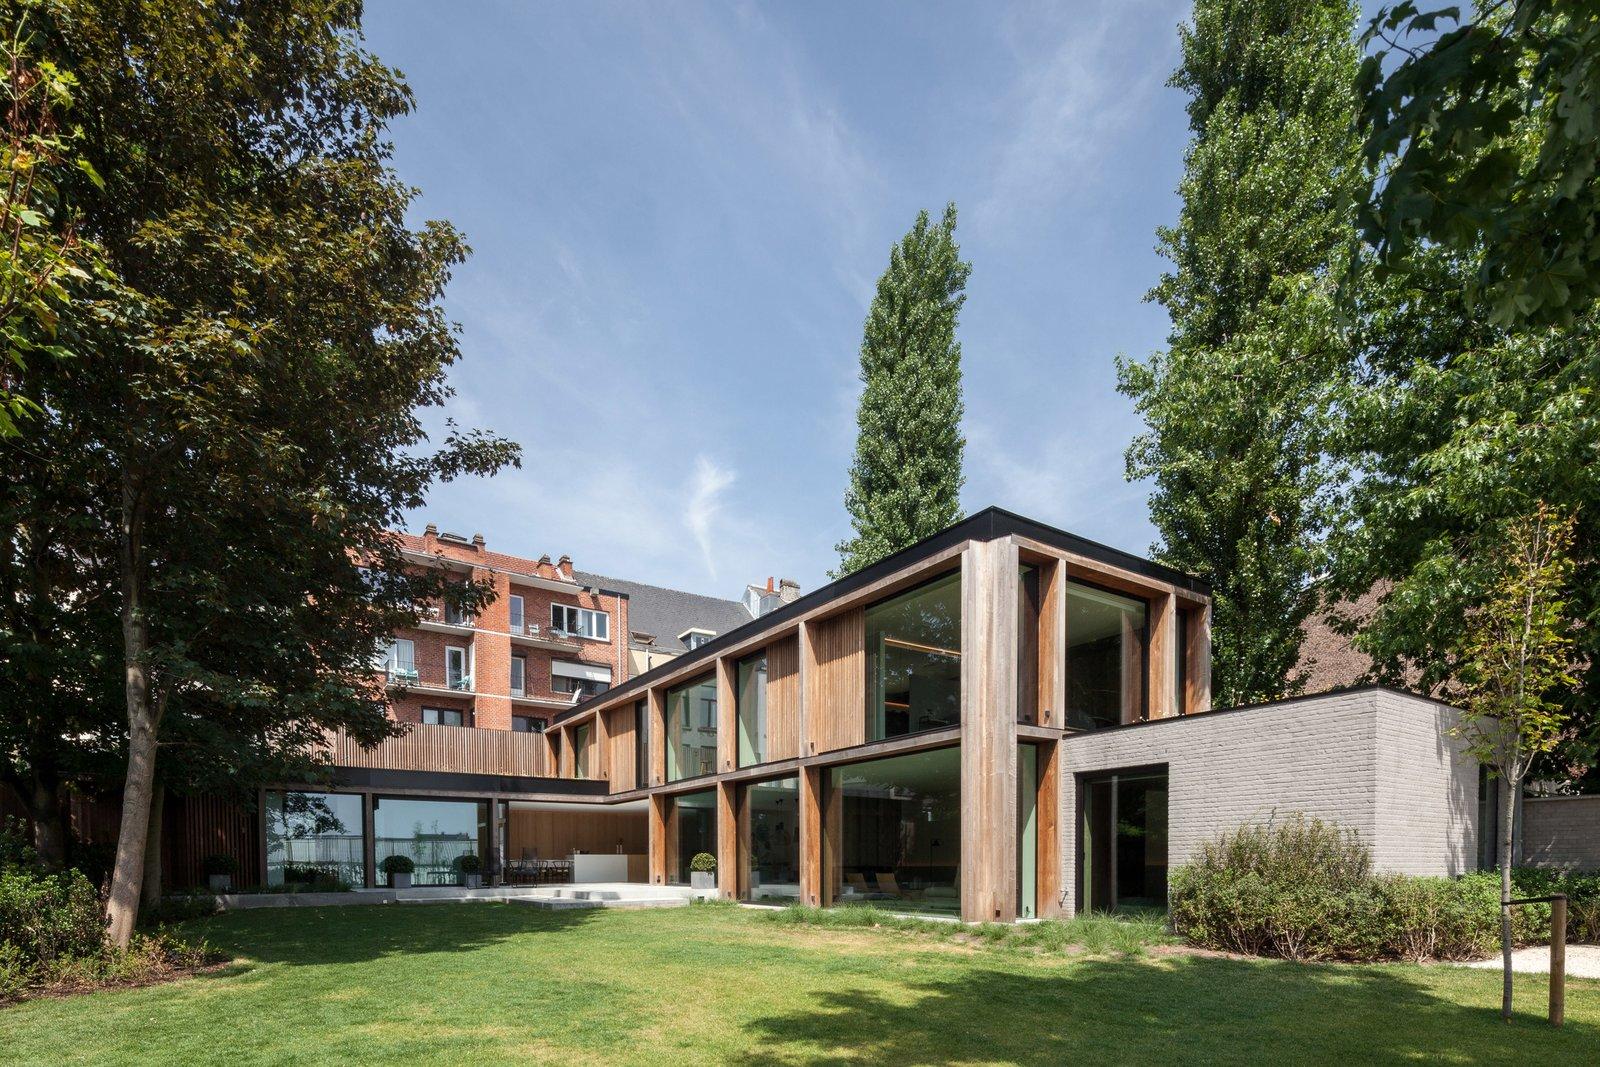 Exterior, House, Wood, Flat, Glass, and Brick  Best Exterior Glass Brick Wood Photos from This Glass Pied-à-Terre Is Hidden in a Belgian Garden